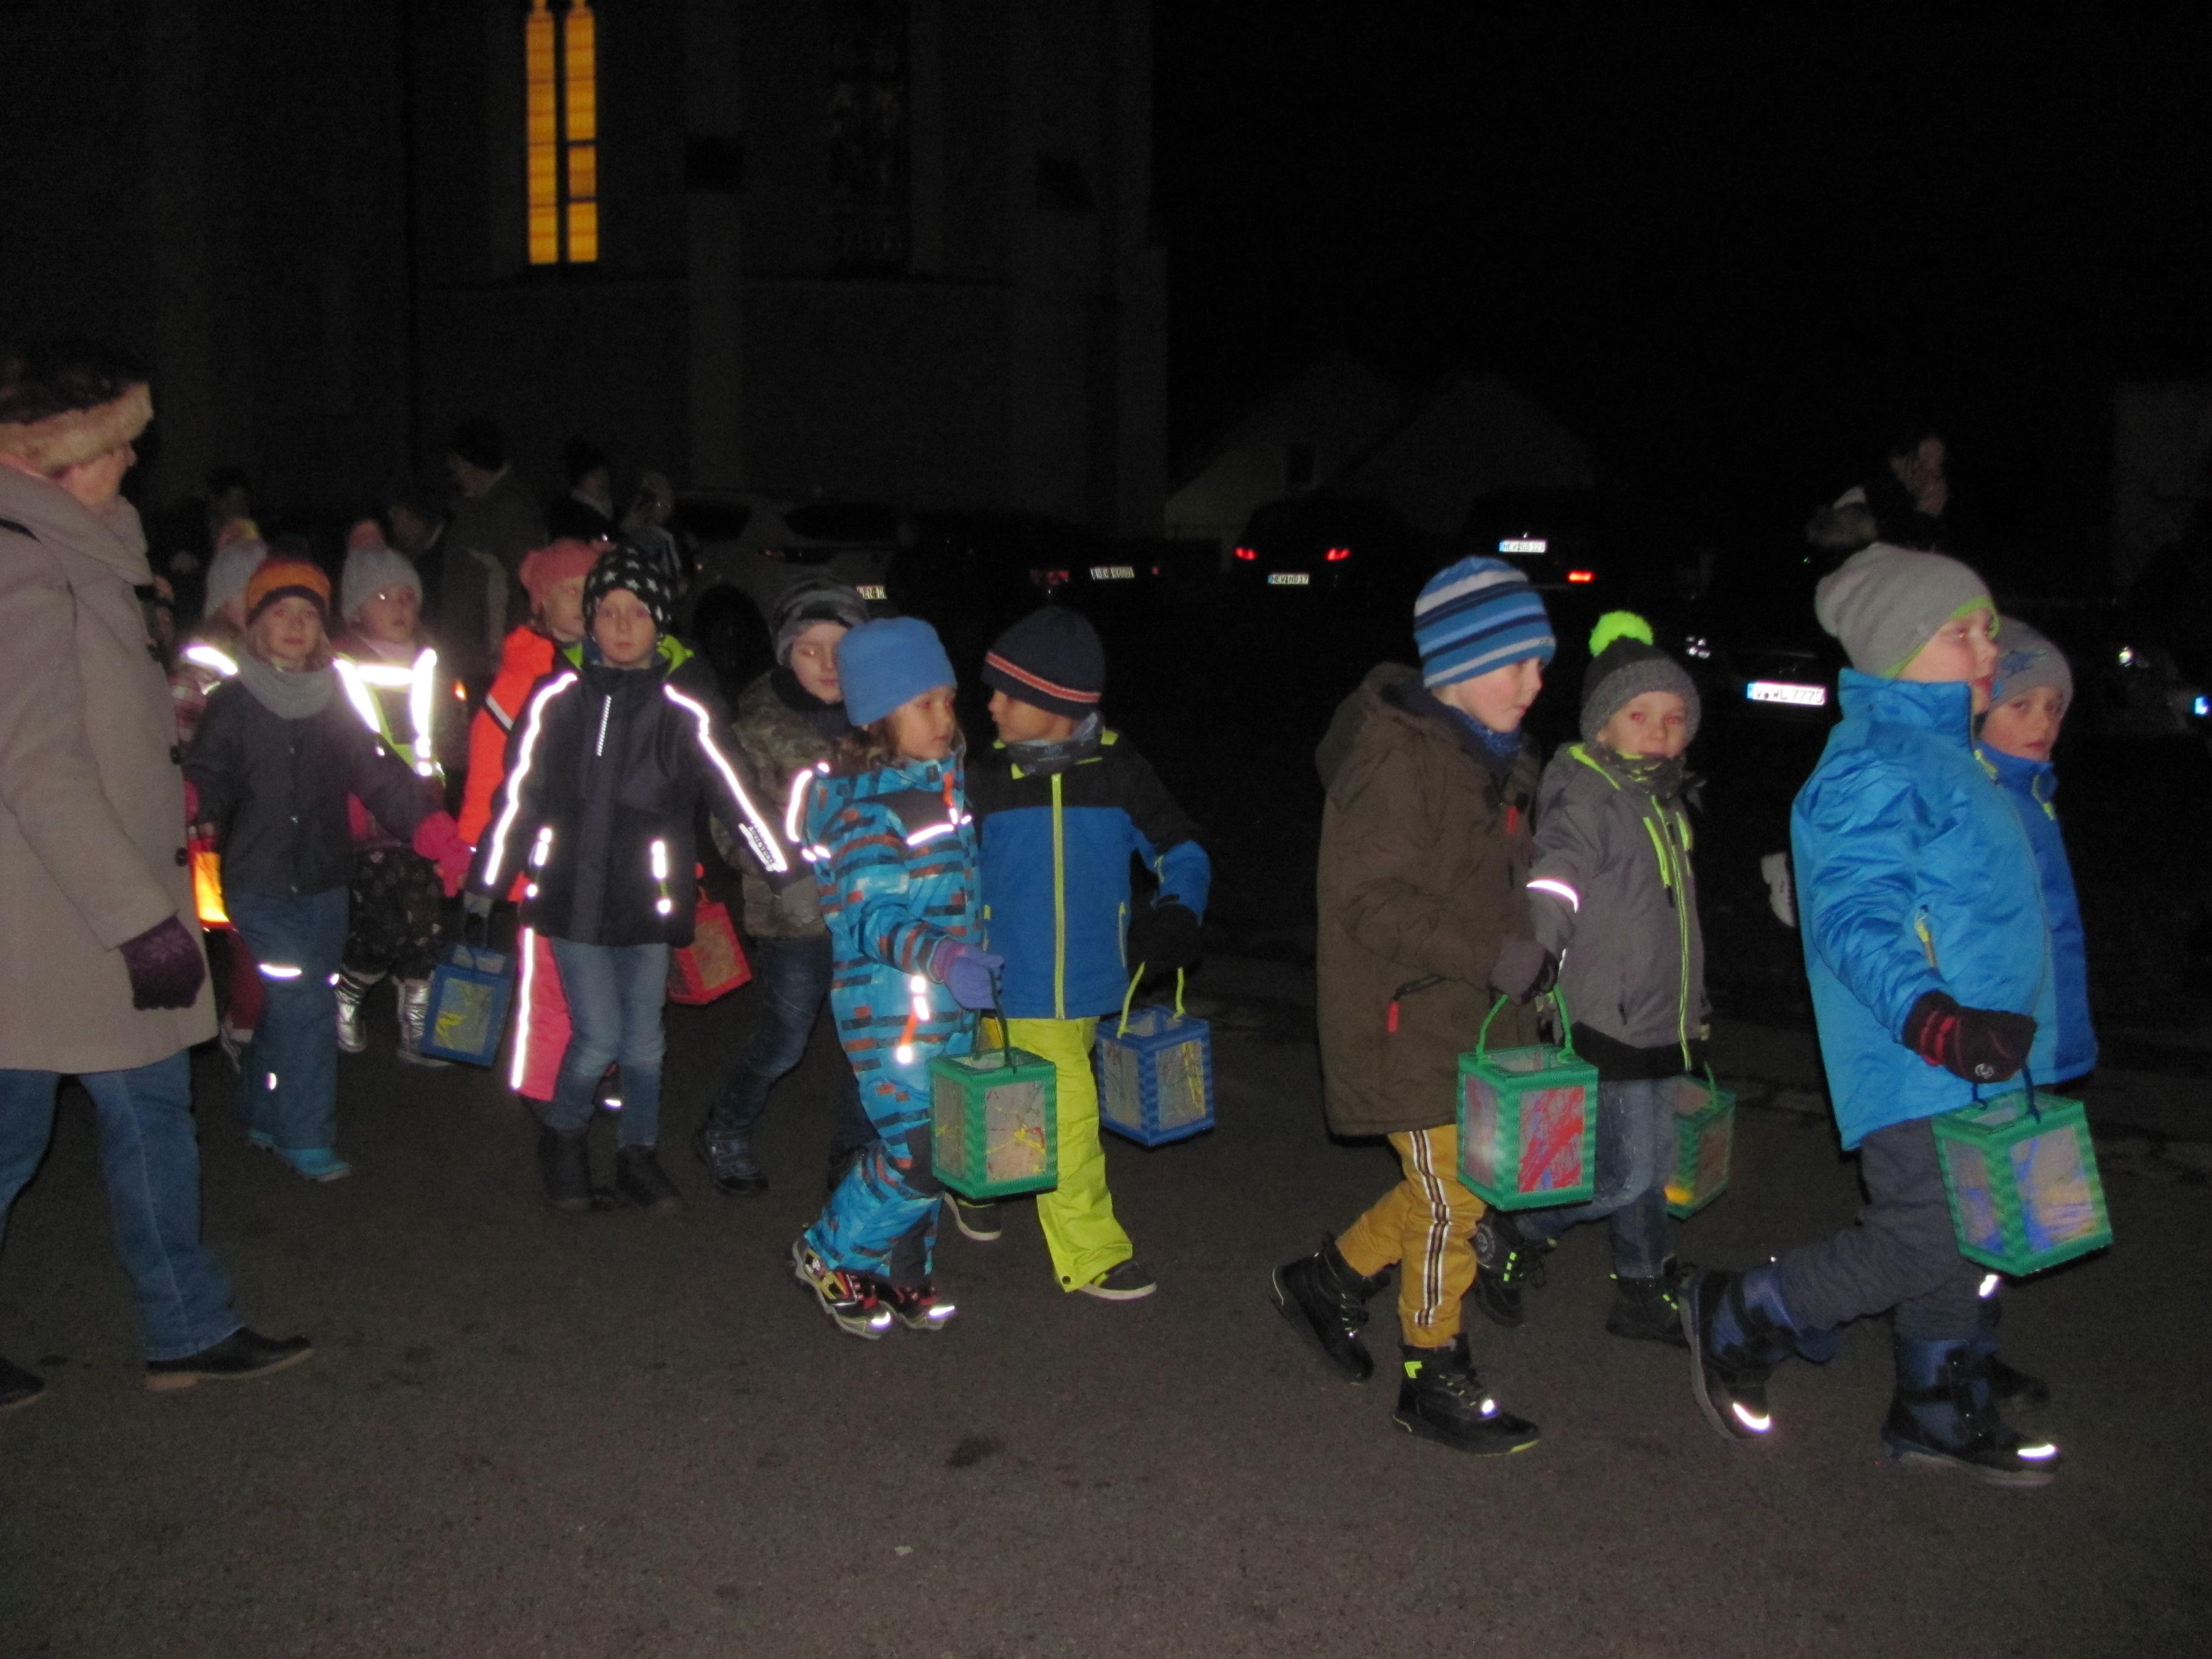 Lebendige Martinsfeier mit Martinszug in Mantel